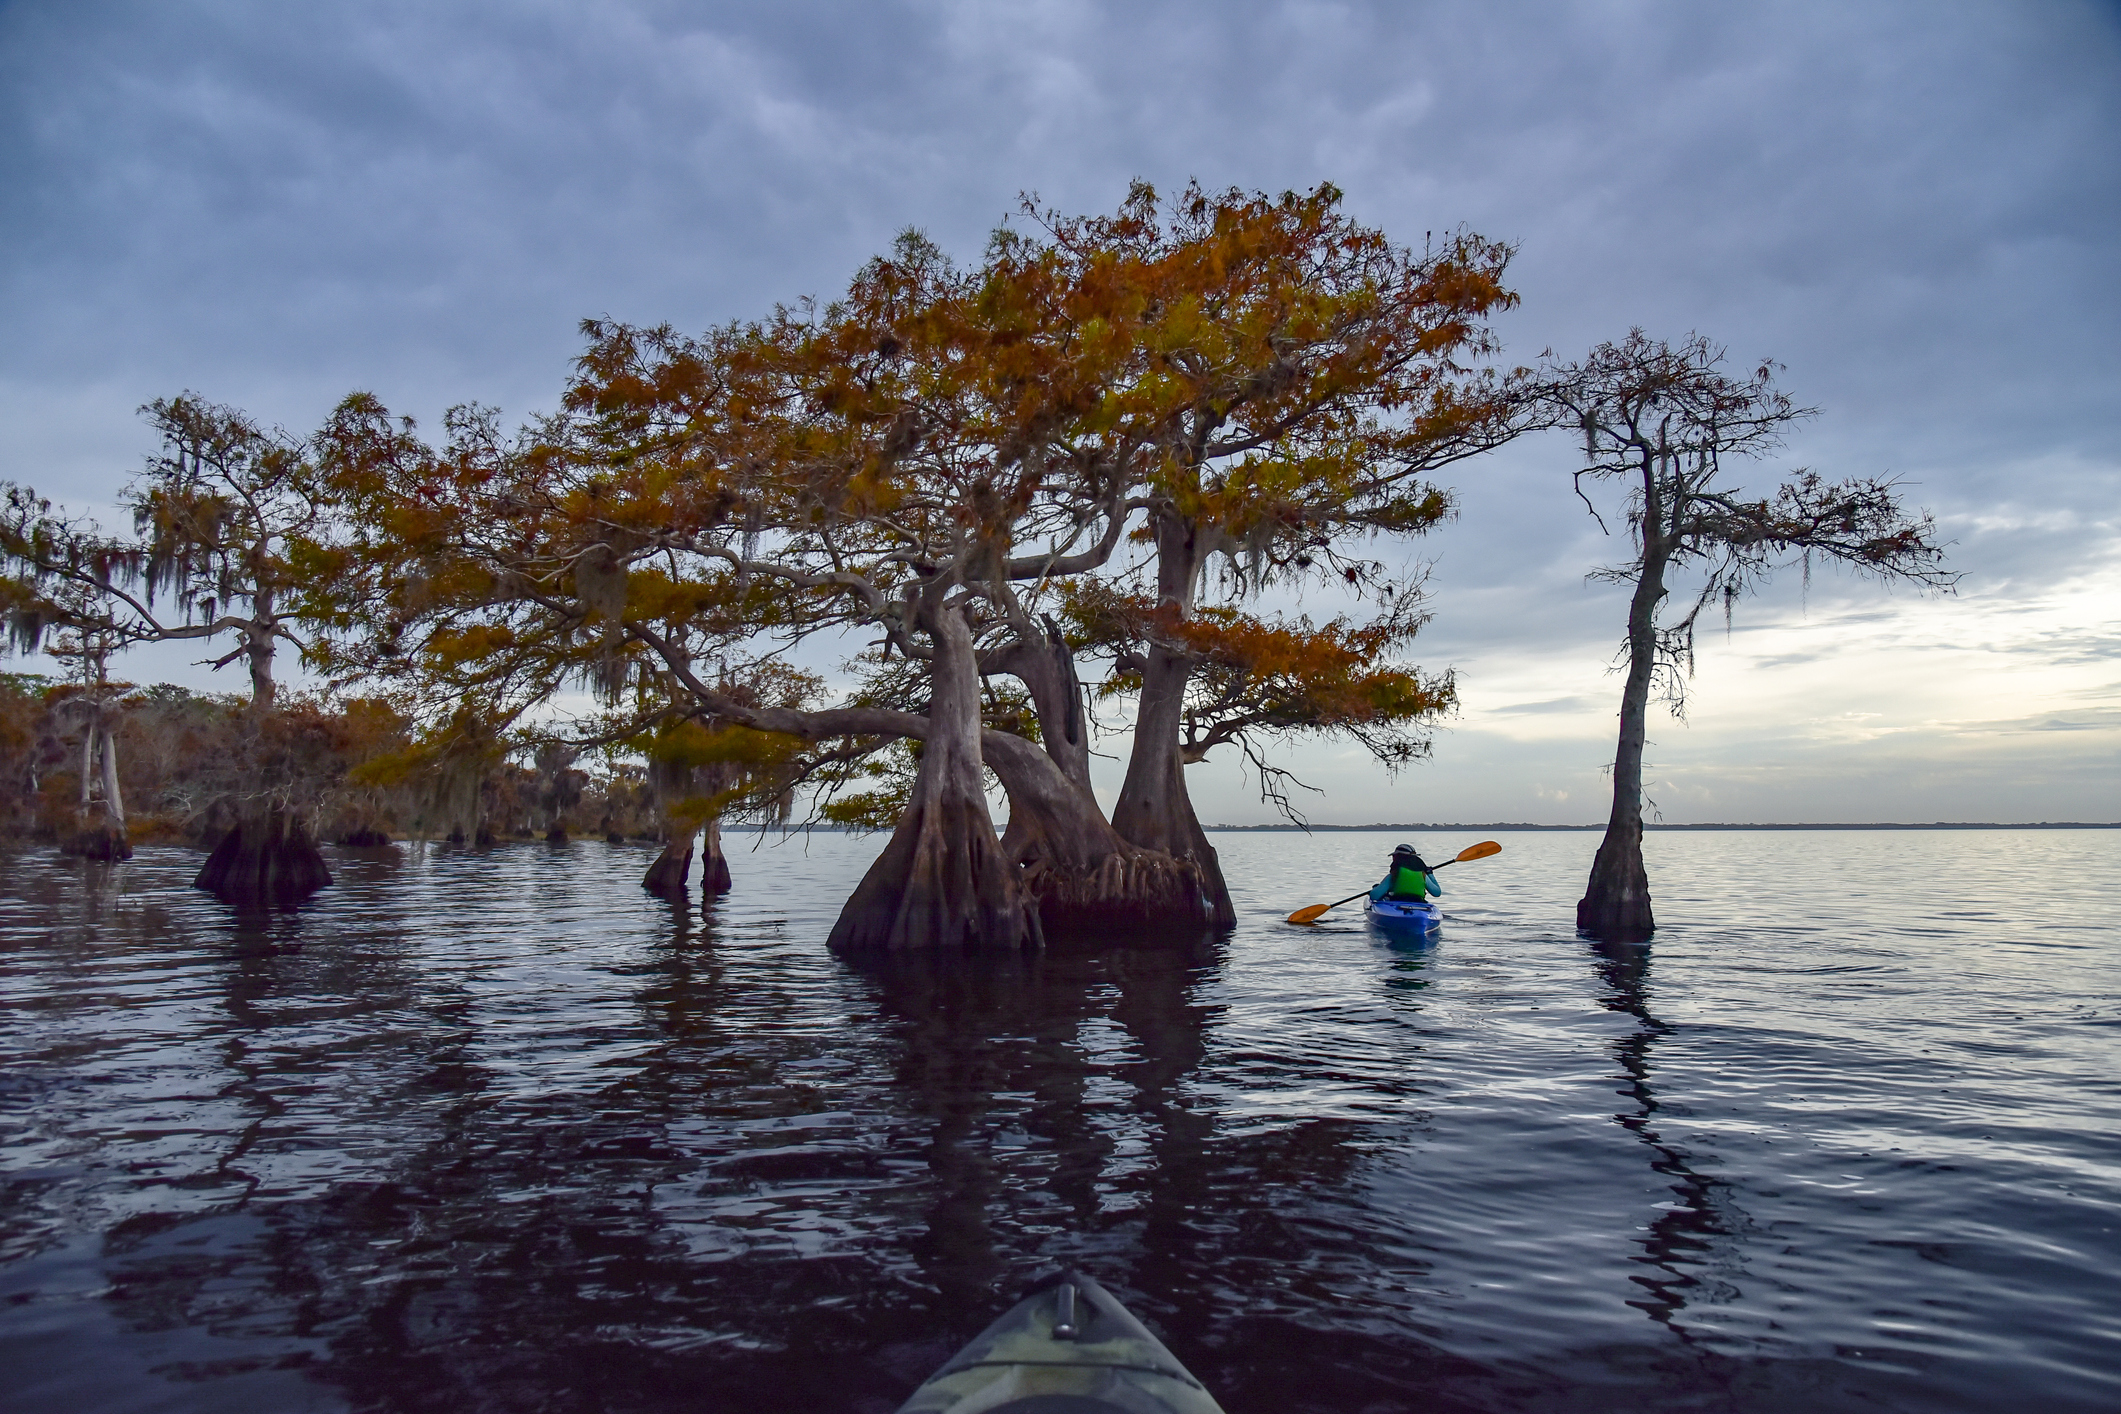 A kayak paddles near trees.